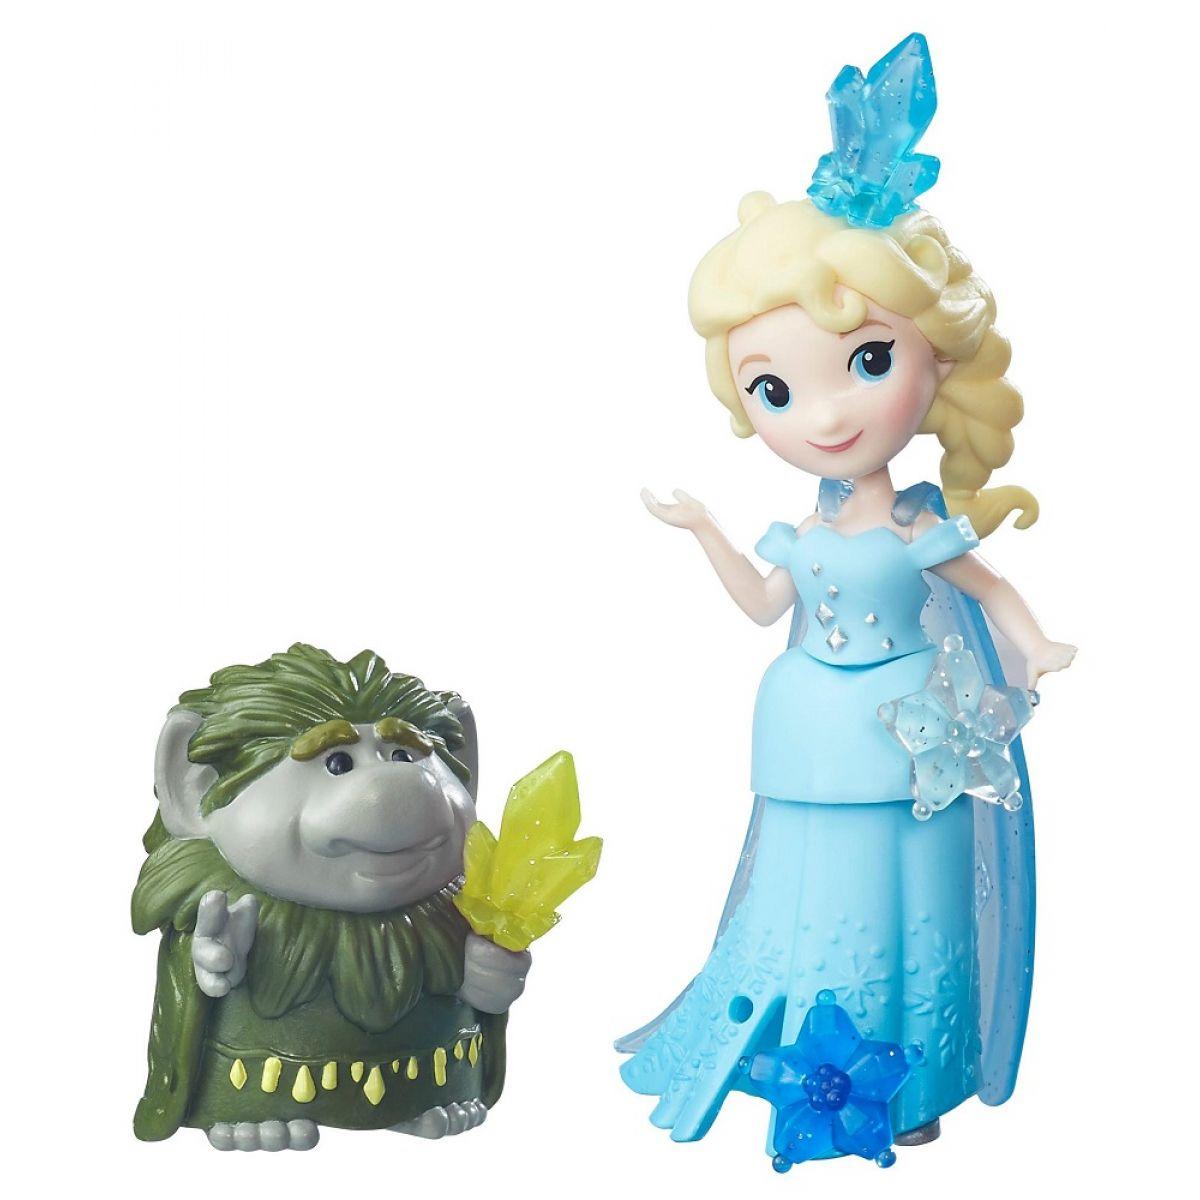 Hasbro Disney Frozen Little Kingdom Mini panenka s kamarádem Elsa & Grand Pabbie